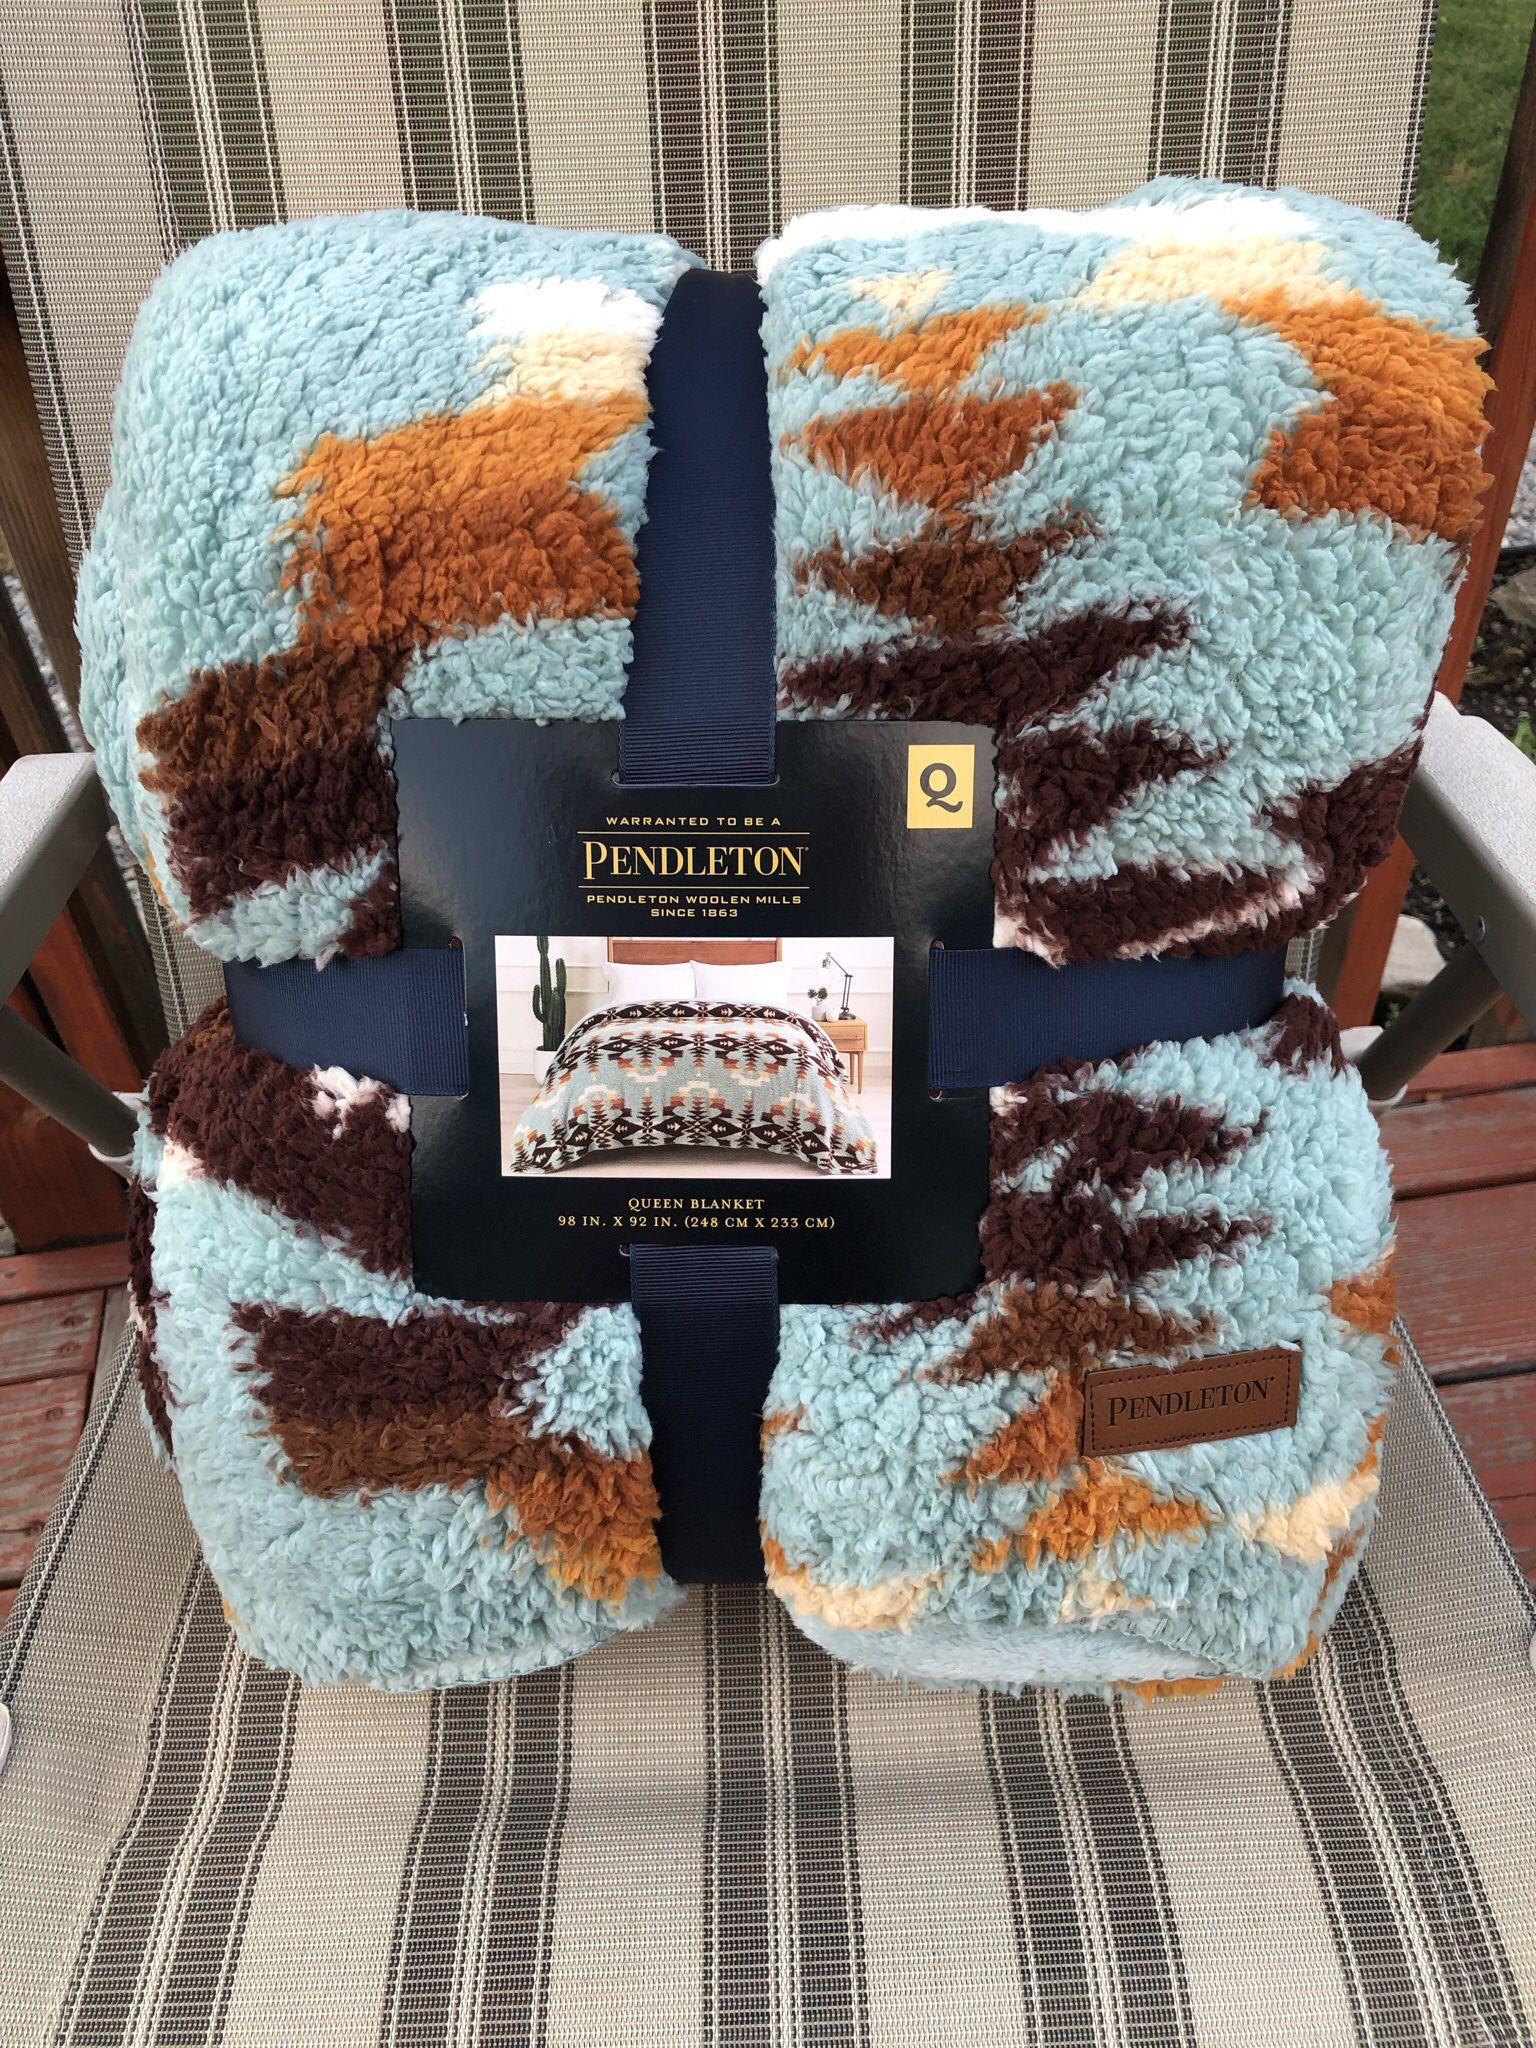 🌟🌟 NEW Pendleton Sherpa Fleece Blanket Queen Size Avra Valley Teal Southwest 98 x92🌟🌟